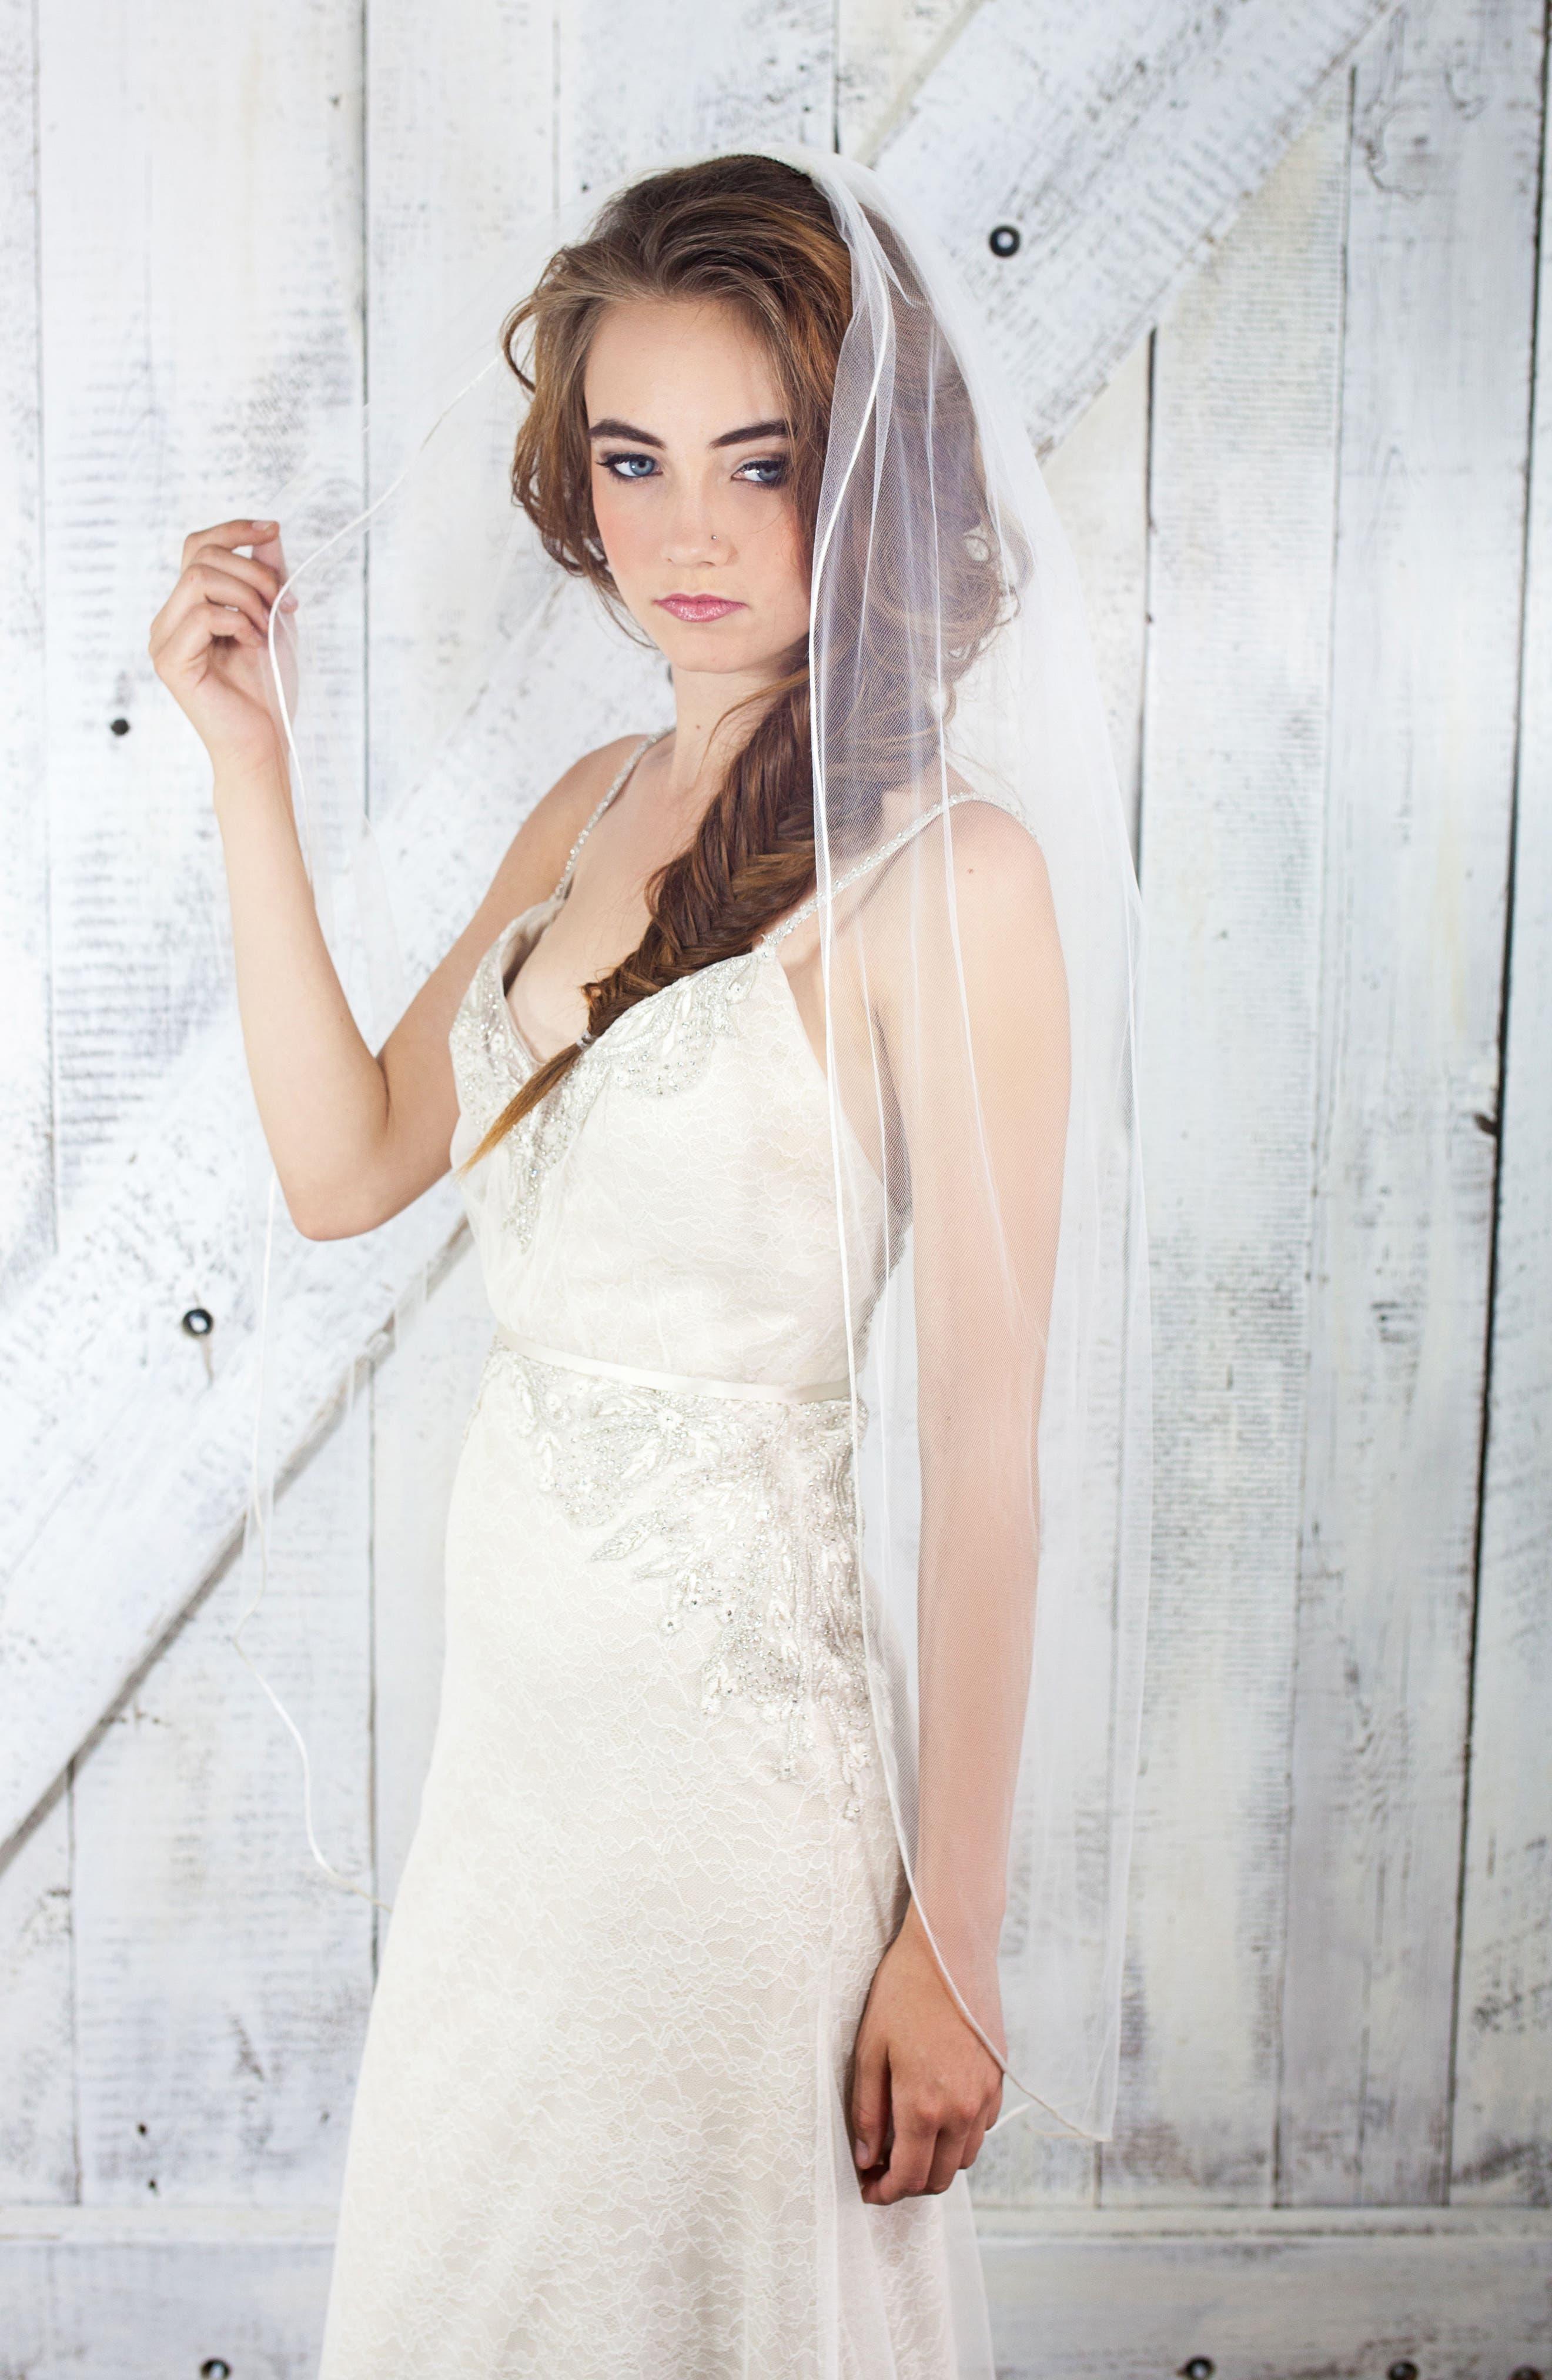 Alternate Image 1 Selected - Veil Trends Cancun Sheer Mesh Bridal Veil